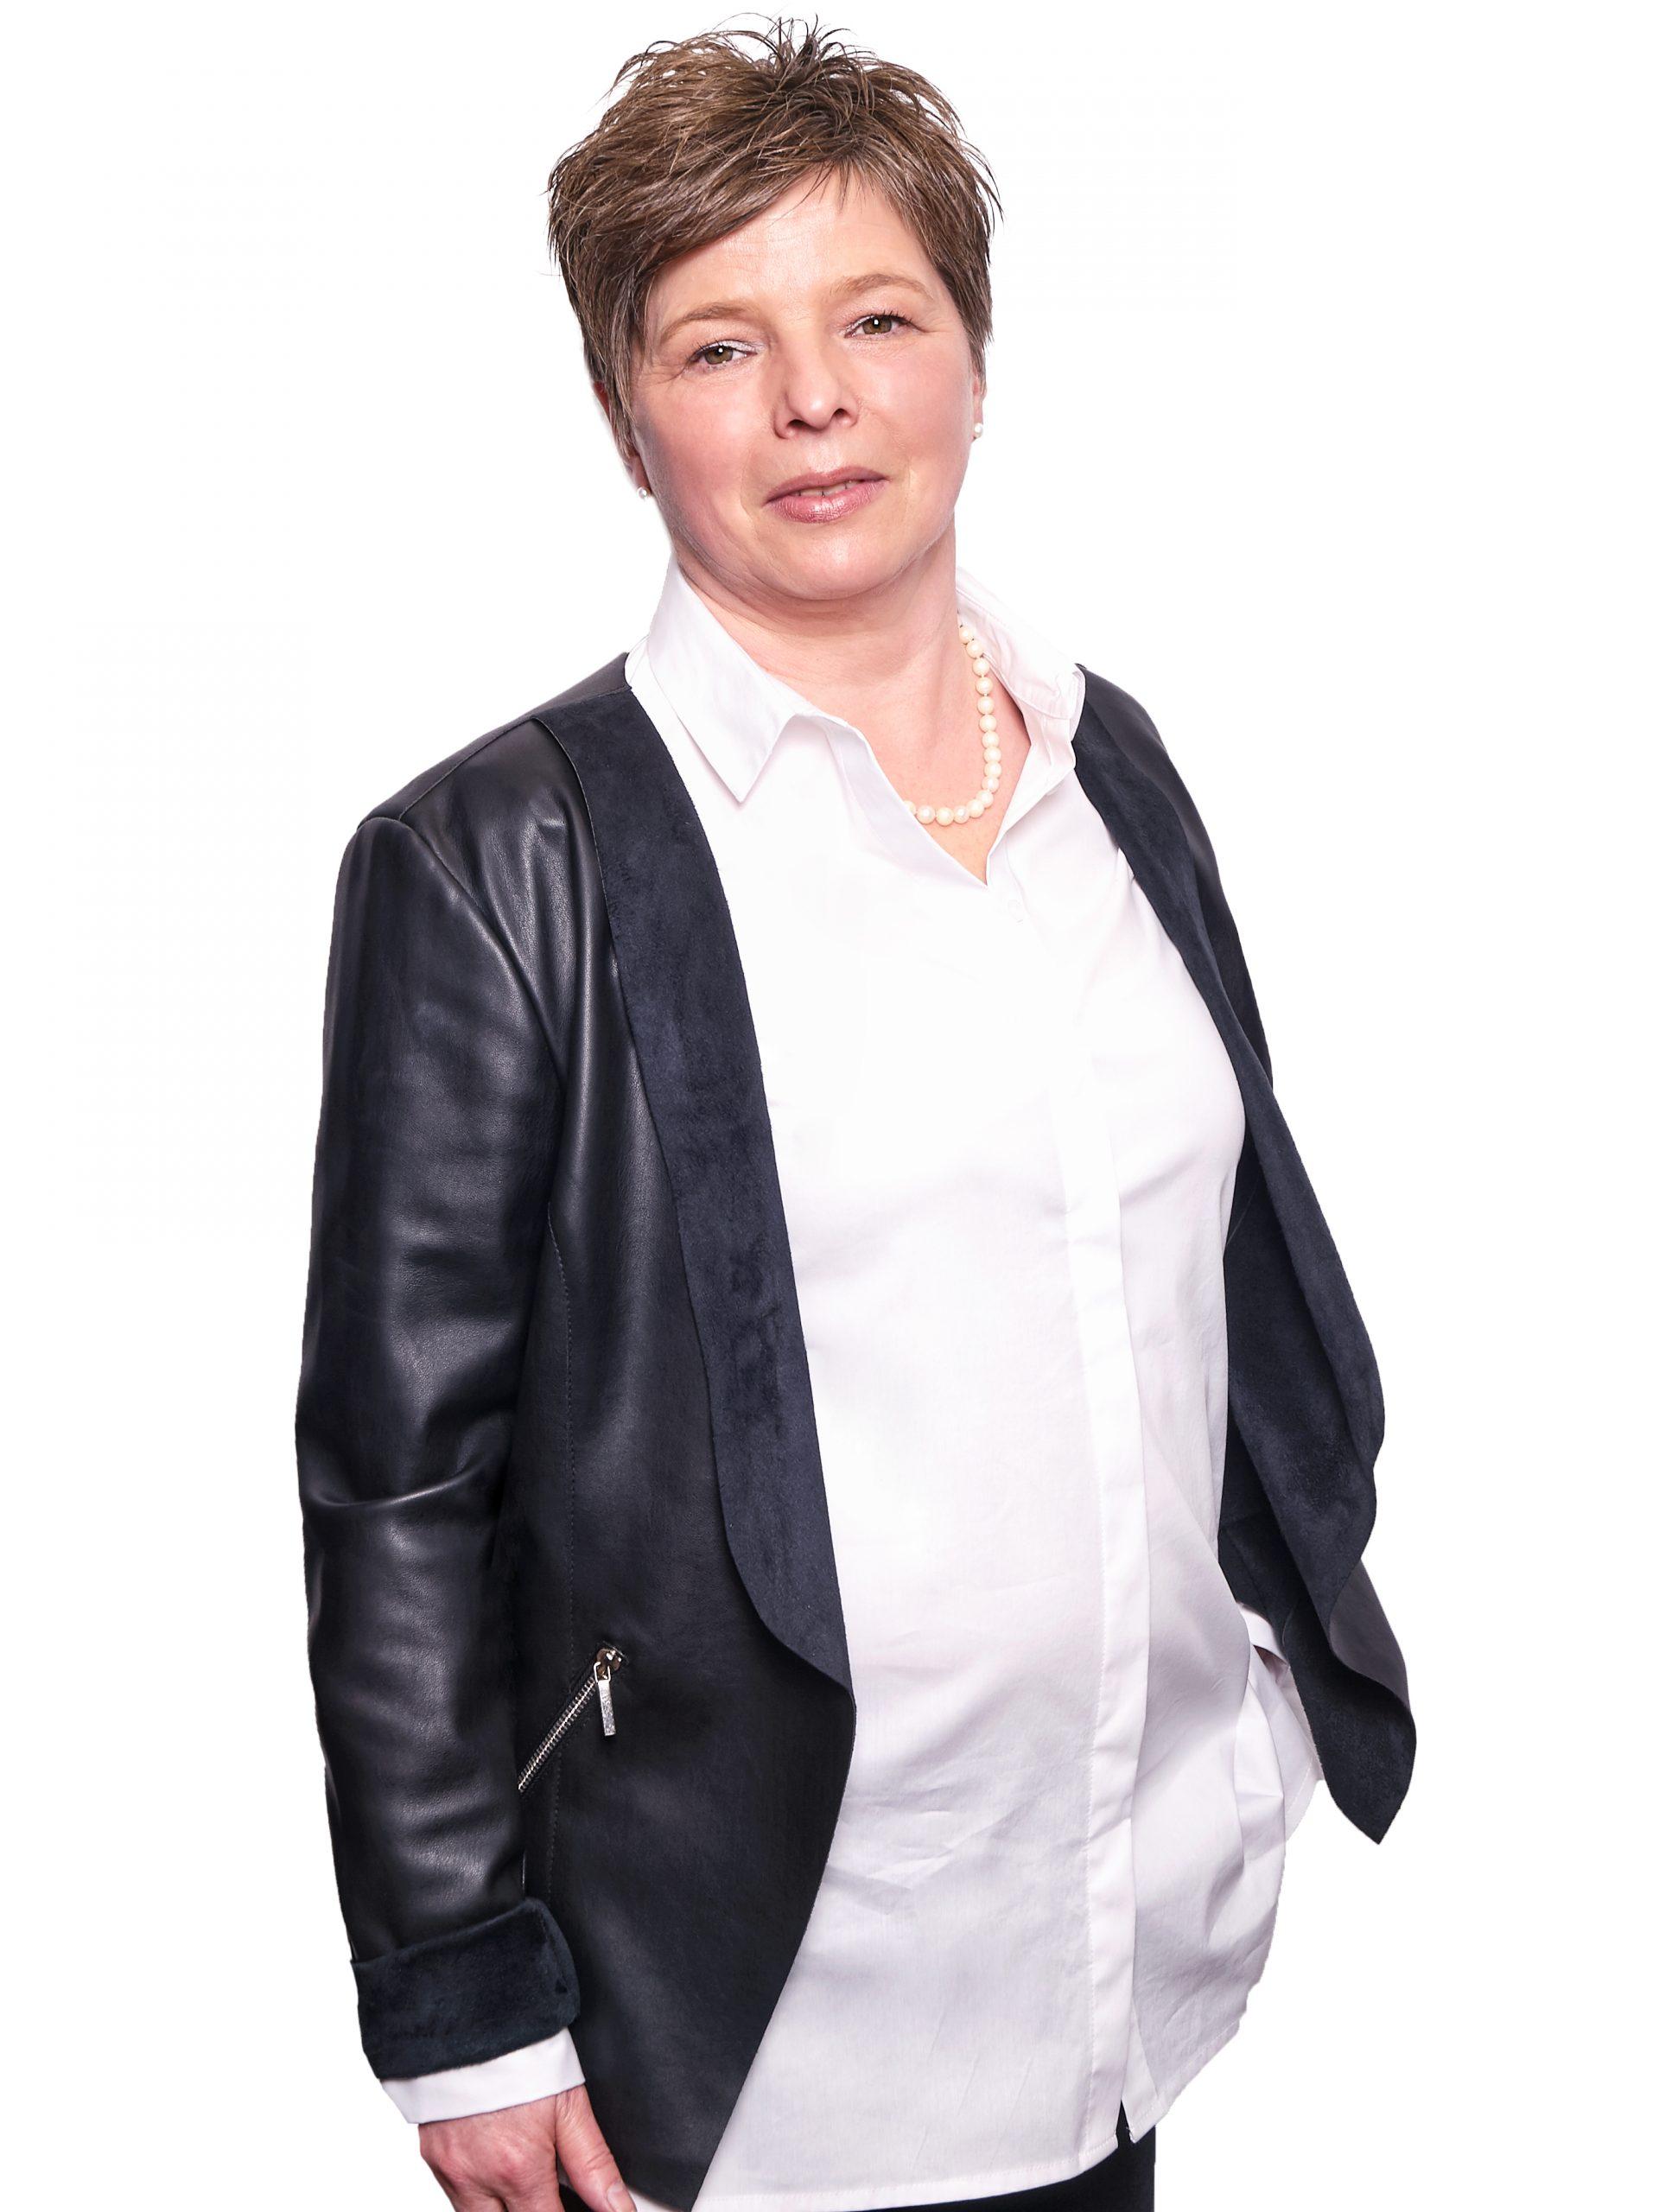 Astrid Niemeyer